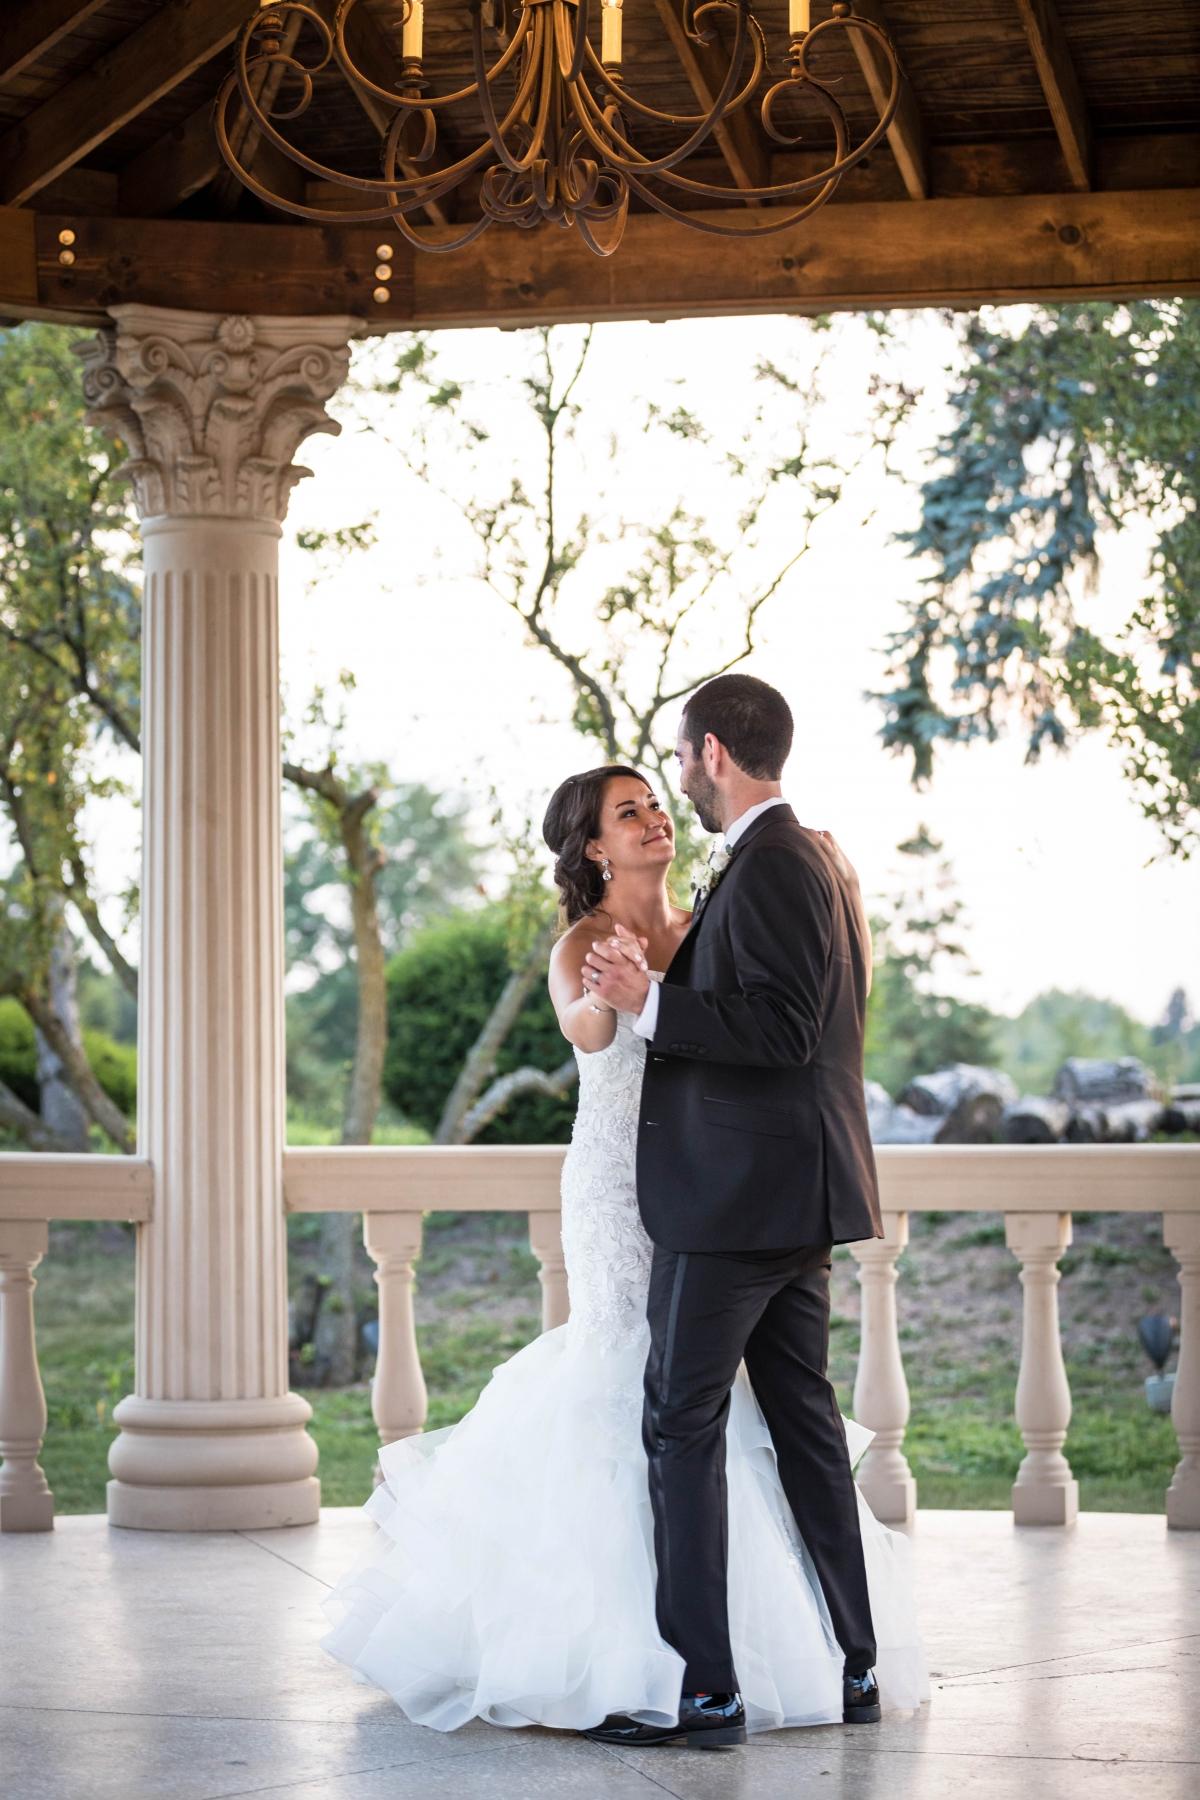 marie.jeremy wedding rachael.schirano 788